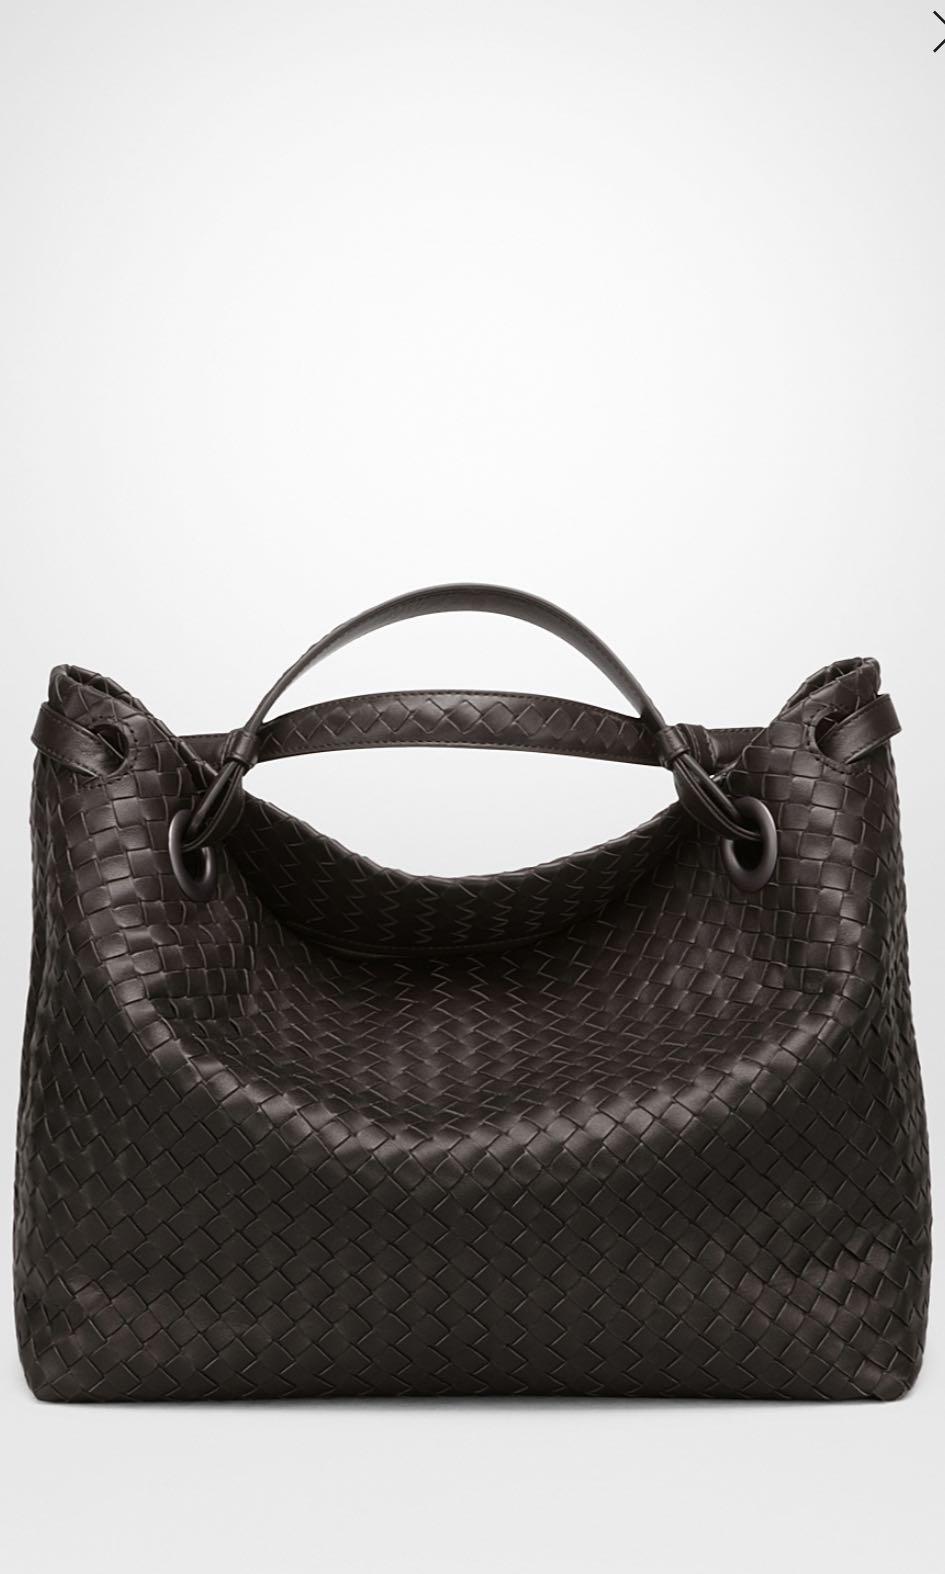 Bottega Veneta Expresso Intrecciato Nappa Medium Garda Bag aaab9e9330c92